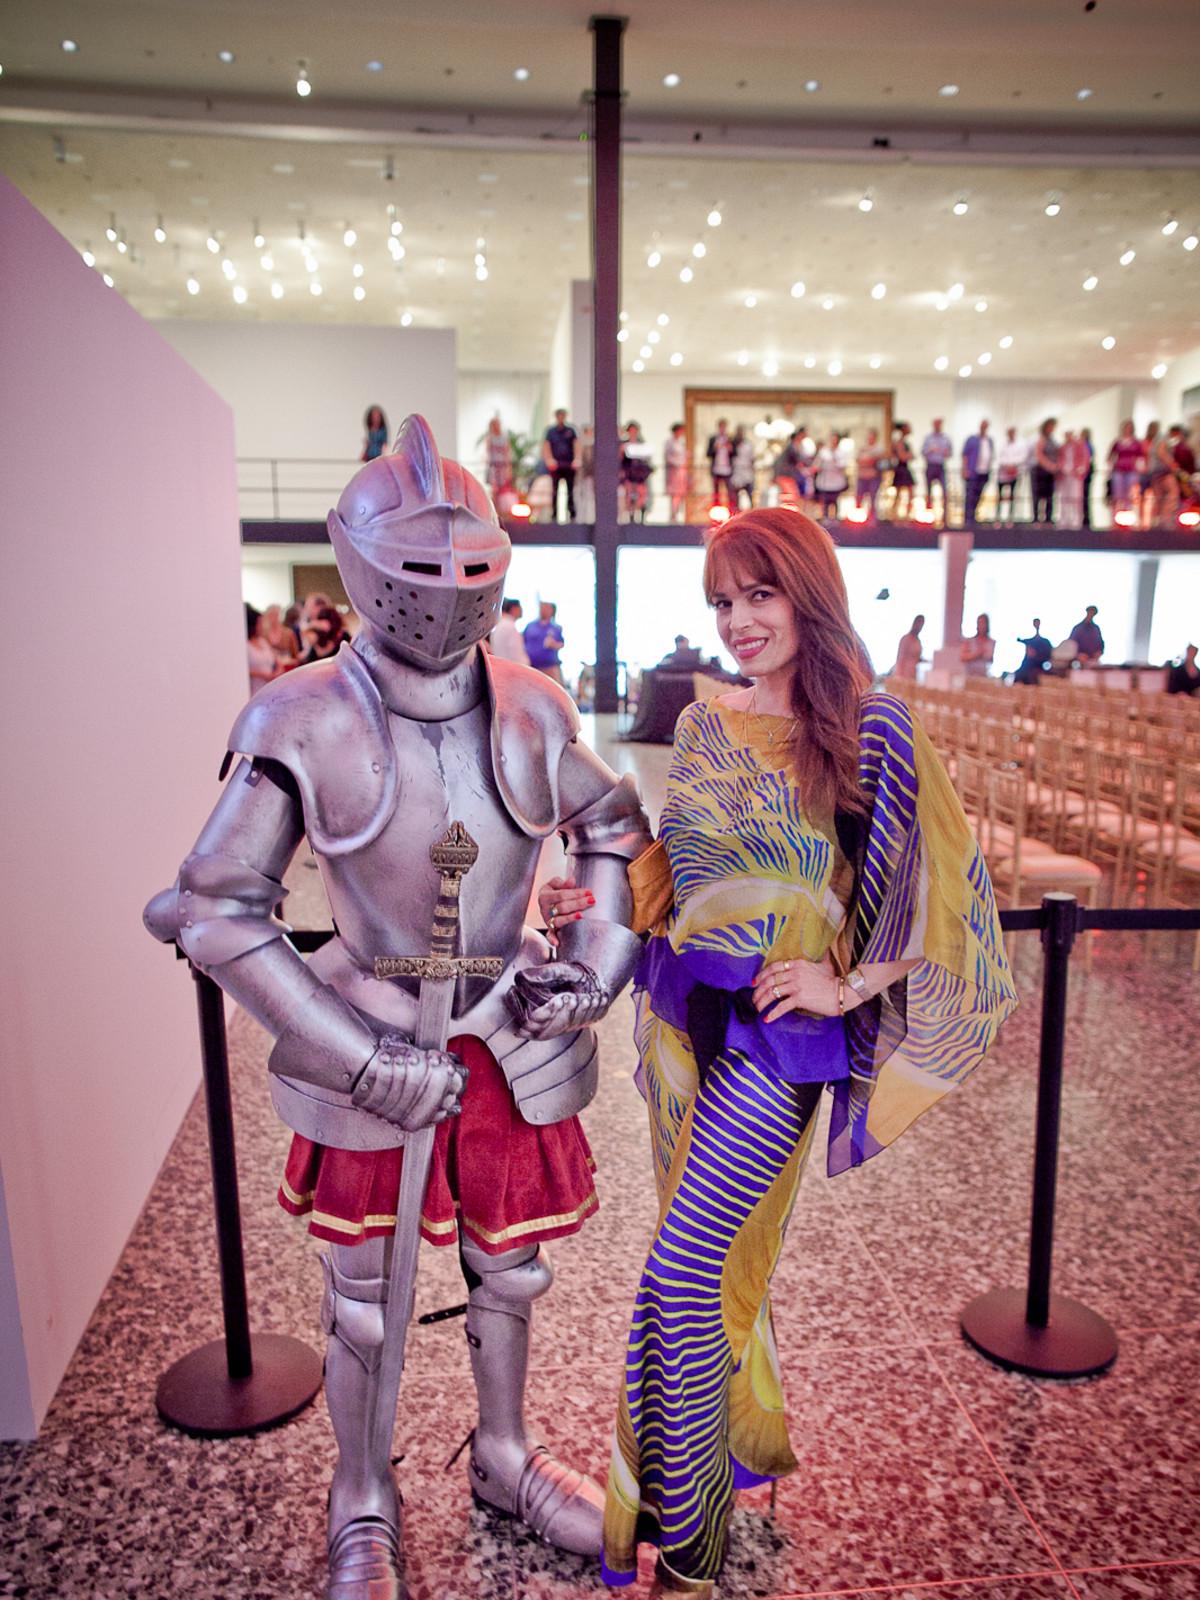 Houston, Fashion Fusion, June 2015, Max The Knight and Karina Barbieri